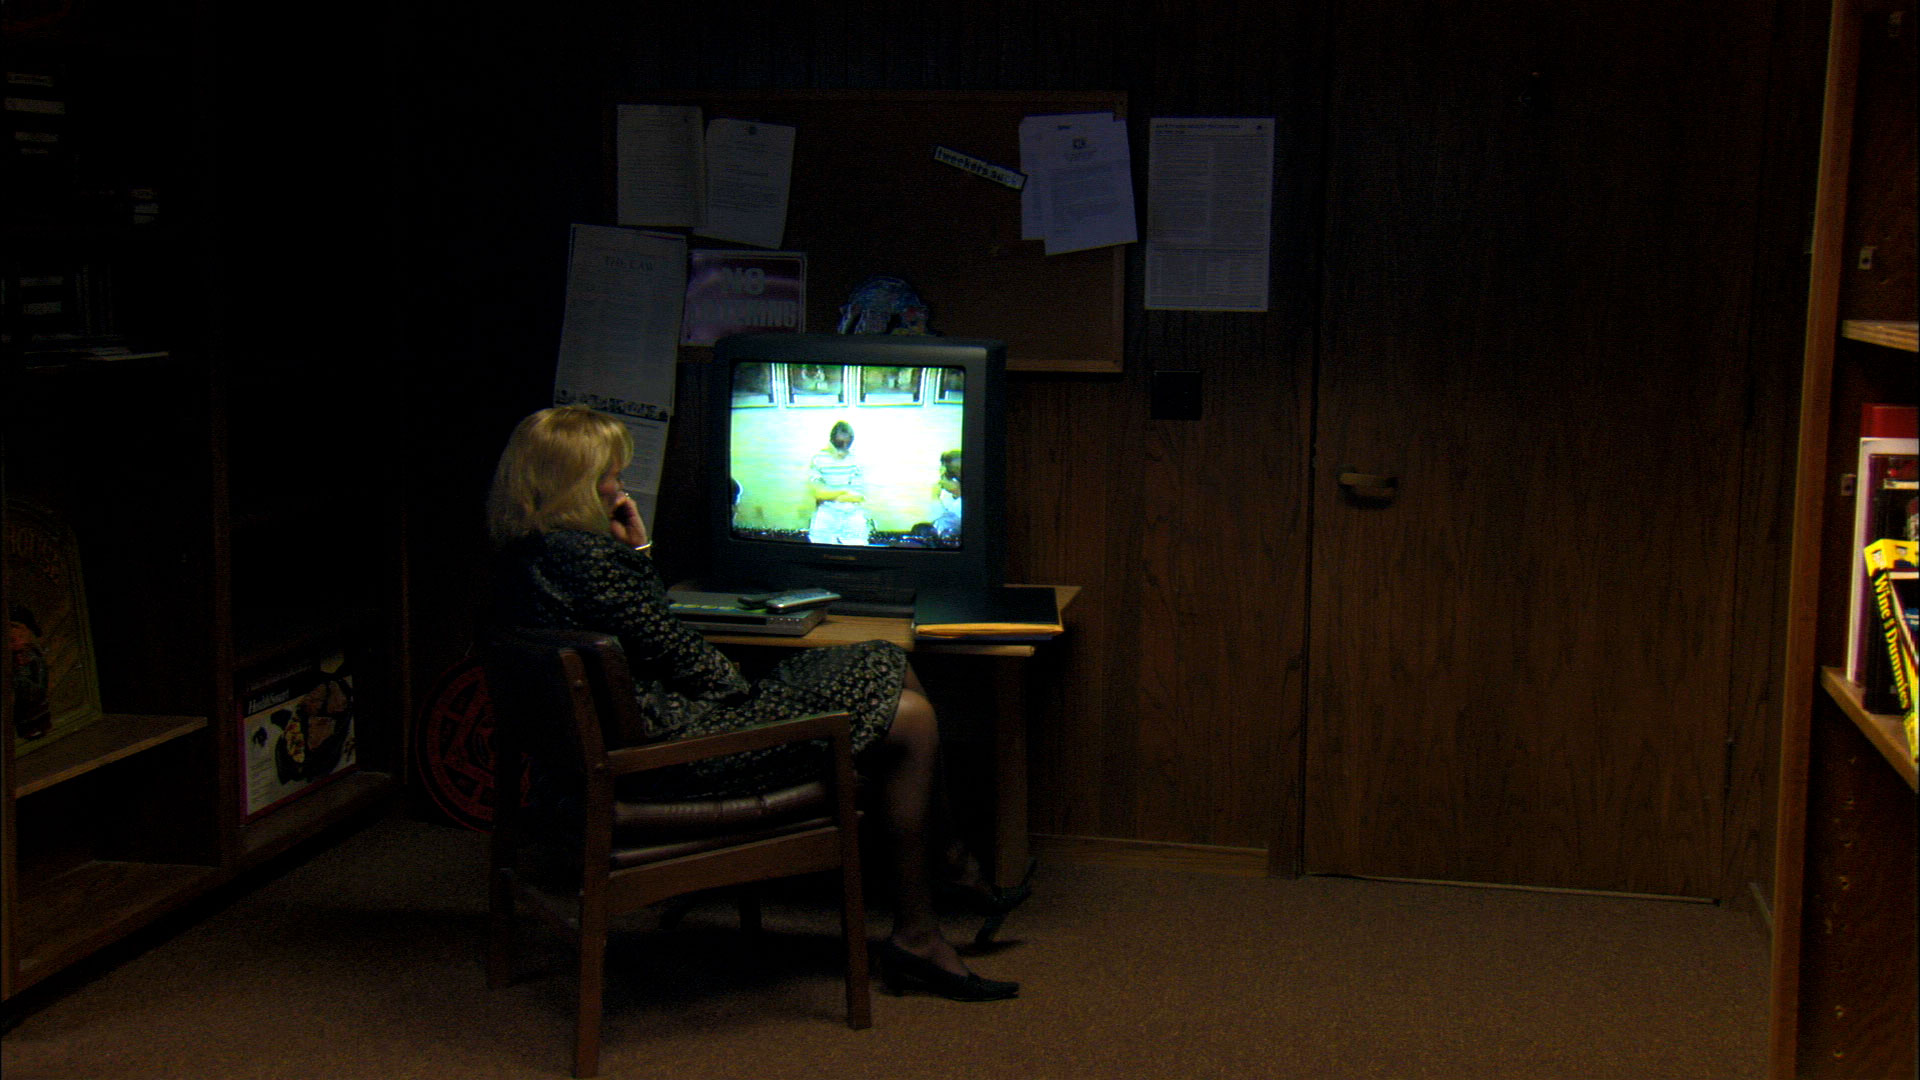 Cold Case Files : The Interrogation/The Slide